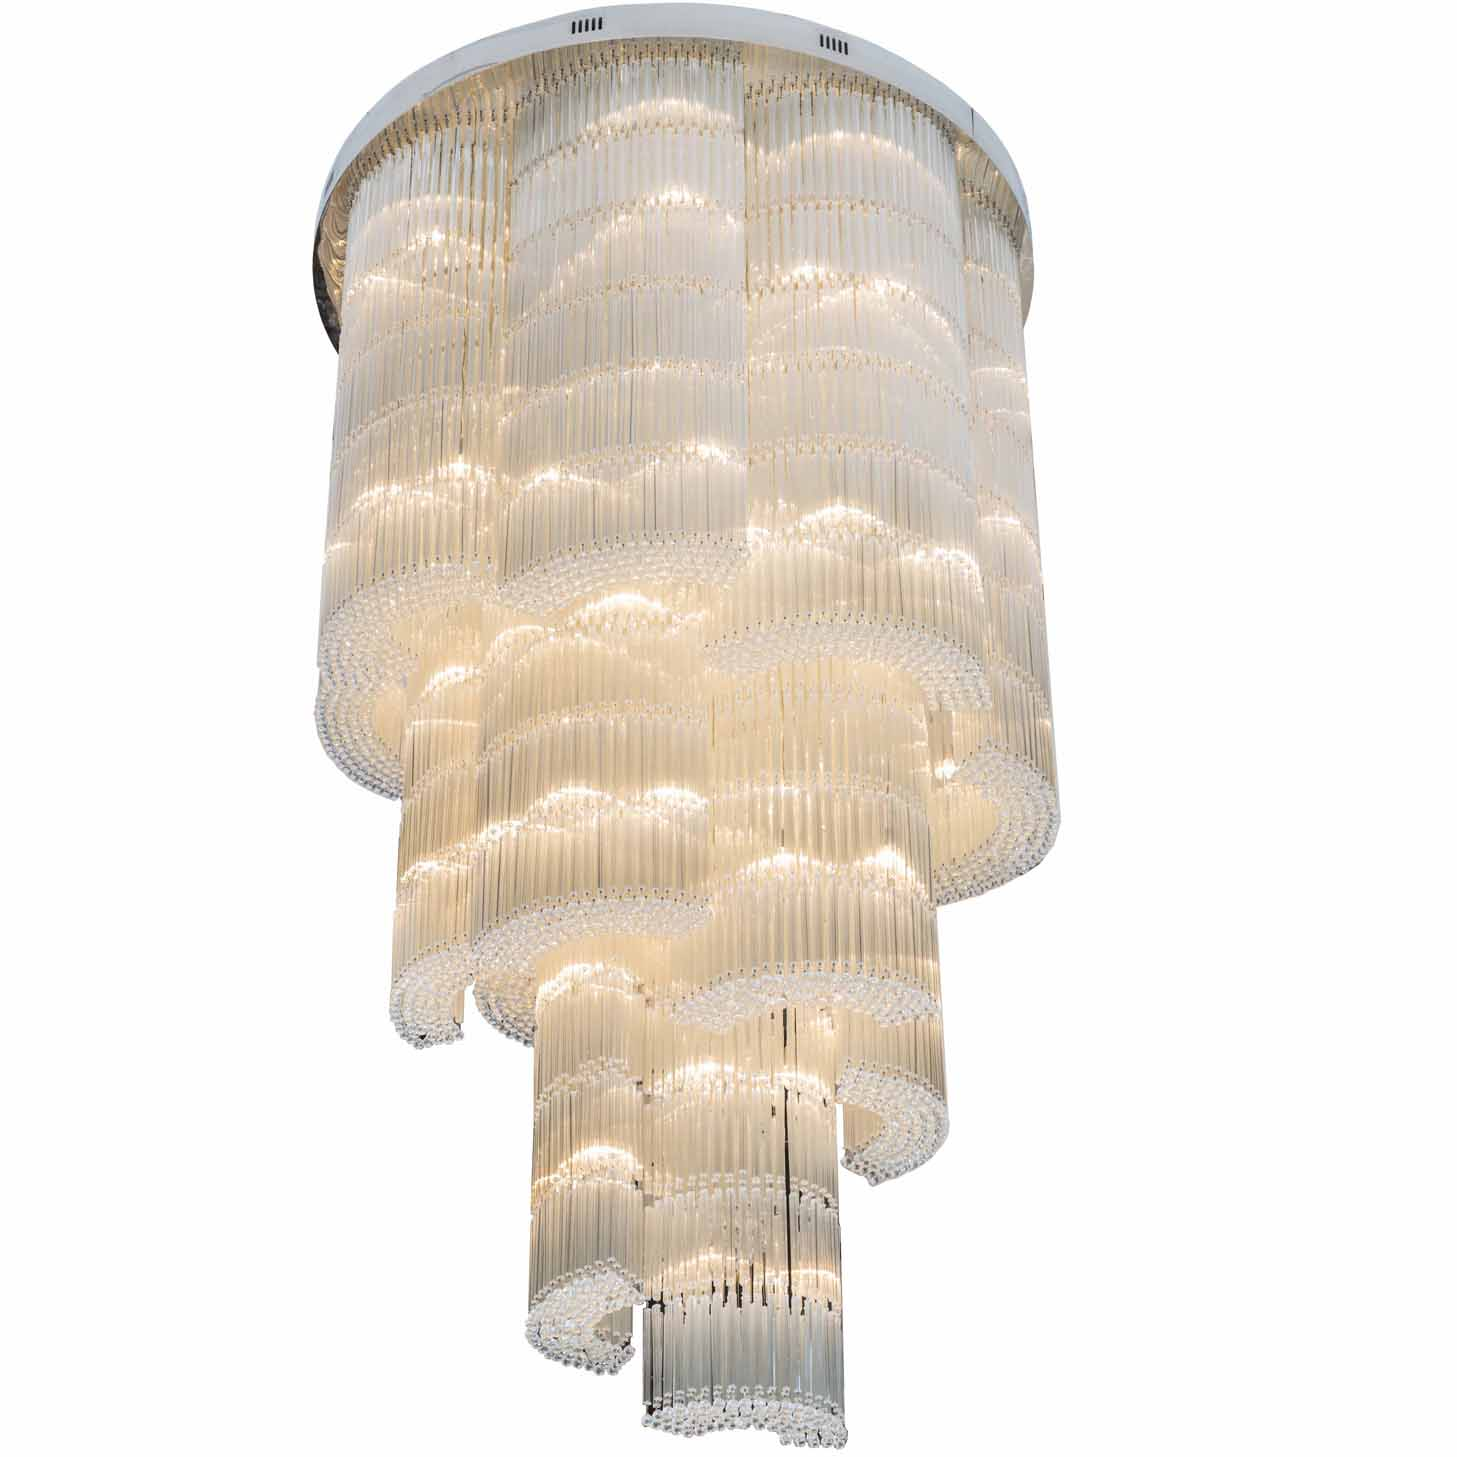 Custom EME chandeliers dining room chandelier EME LIGHTING waist